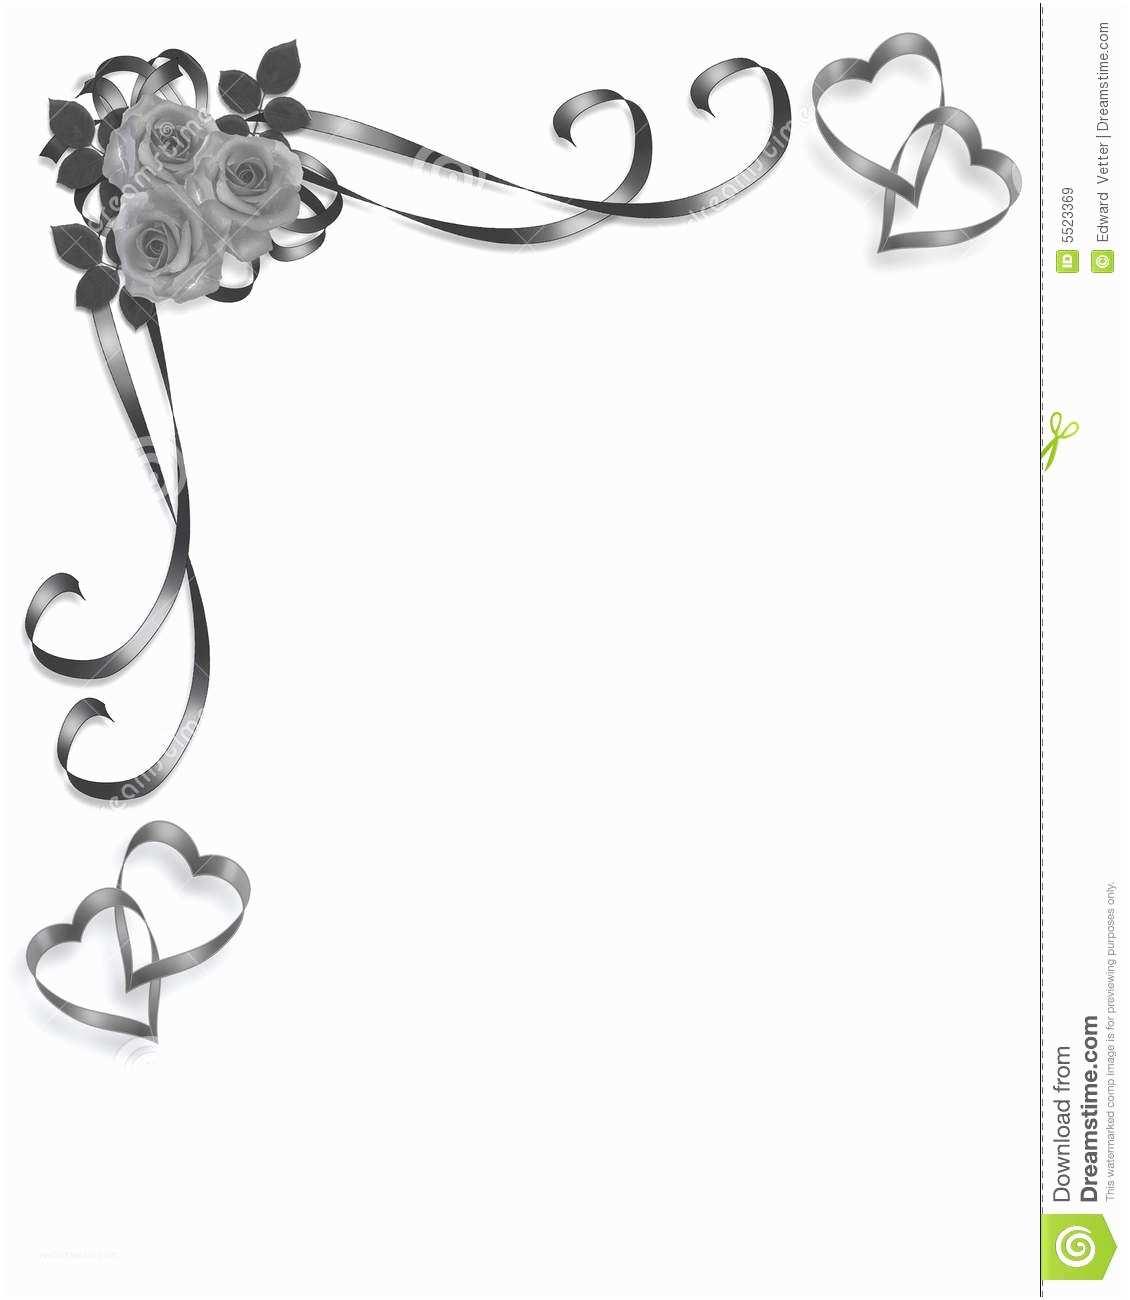 Wedding Invitation Design Images Awesome Wedding Invitation Border Design